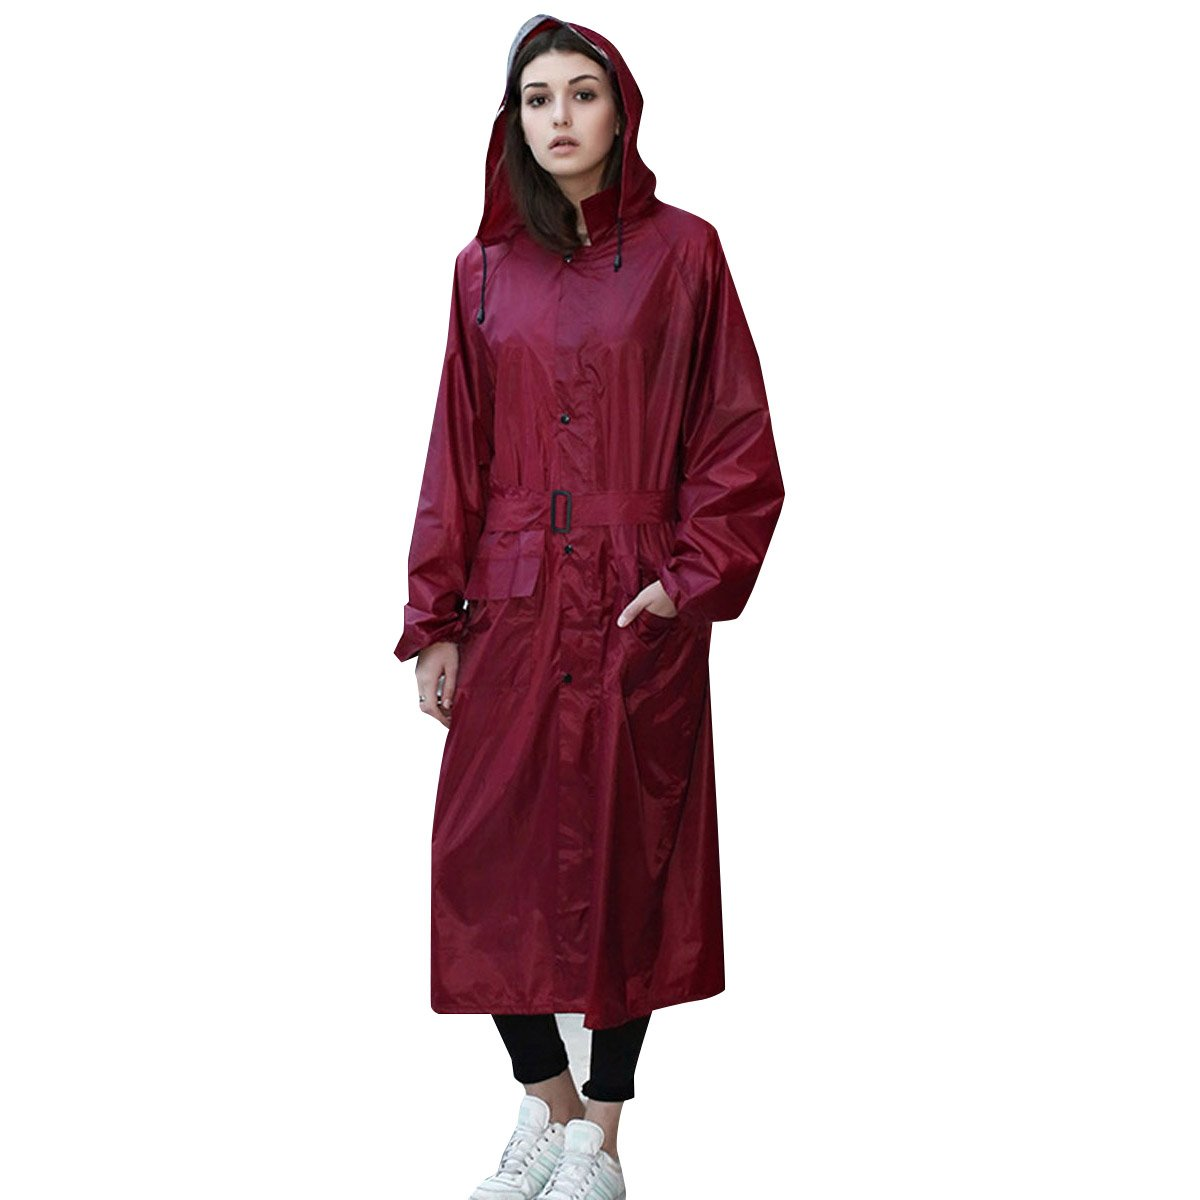 UNIQUEBELLA Womens Thicken Hooded Raincoat with Pocket Waterproof Long Rainwear - Red - 2XL